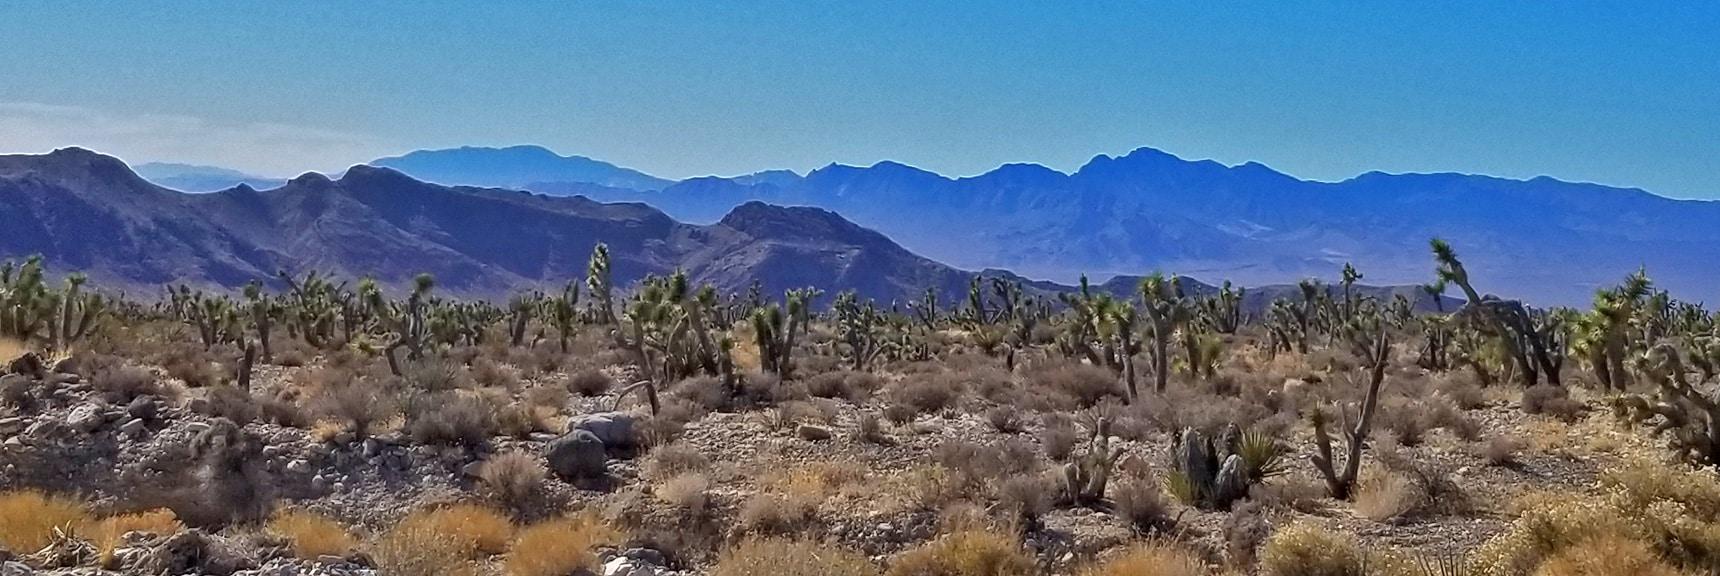 View of Massive Yucca Forest, Endless Joshua Trees   Lower Mormon Well Road   Sheep Range, Desert National Wildlife Refuge, Nevada